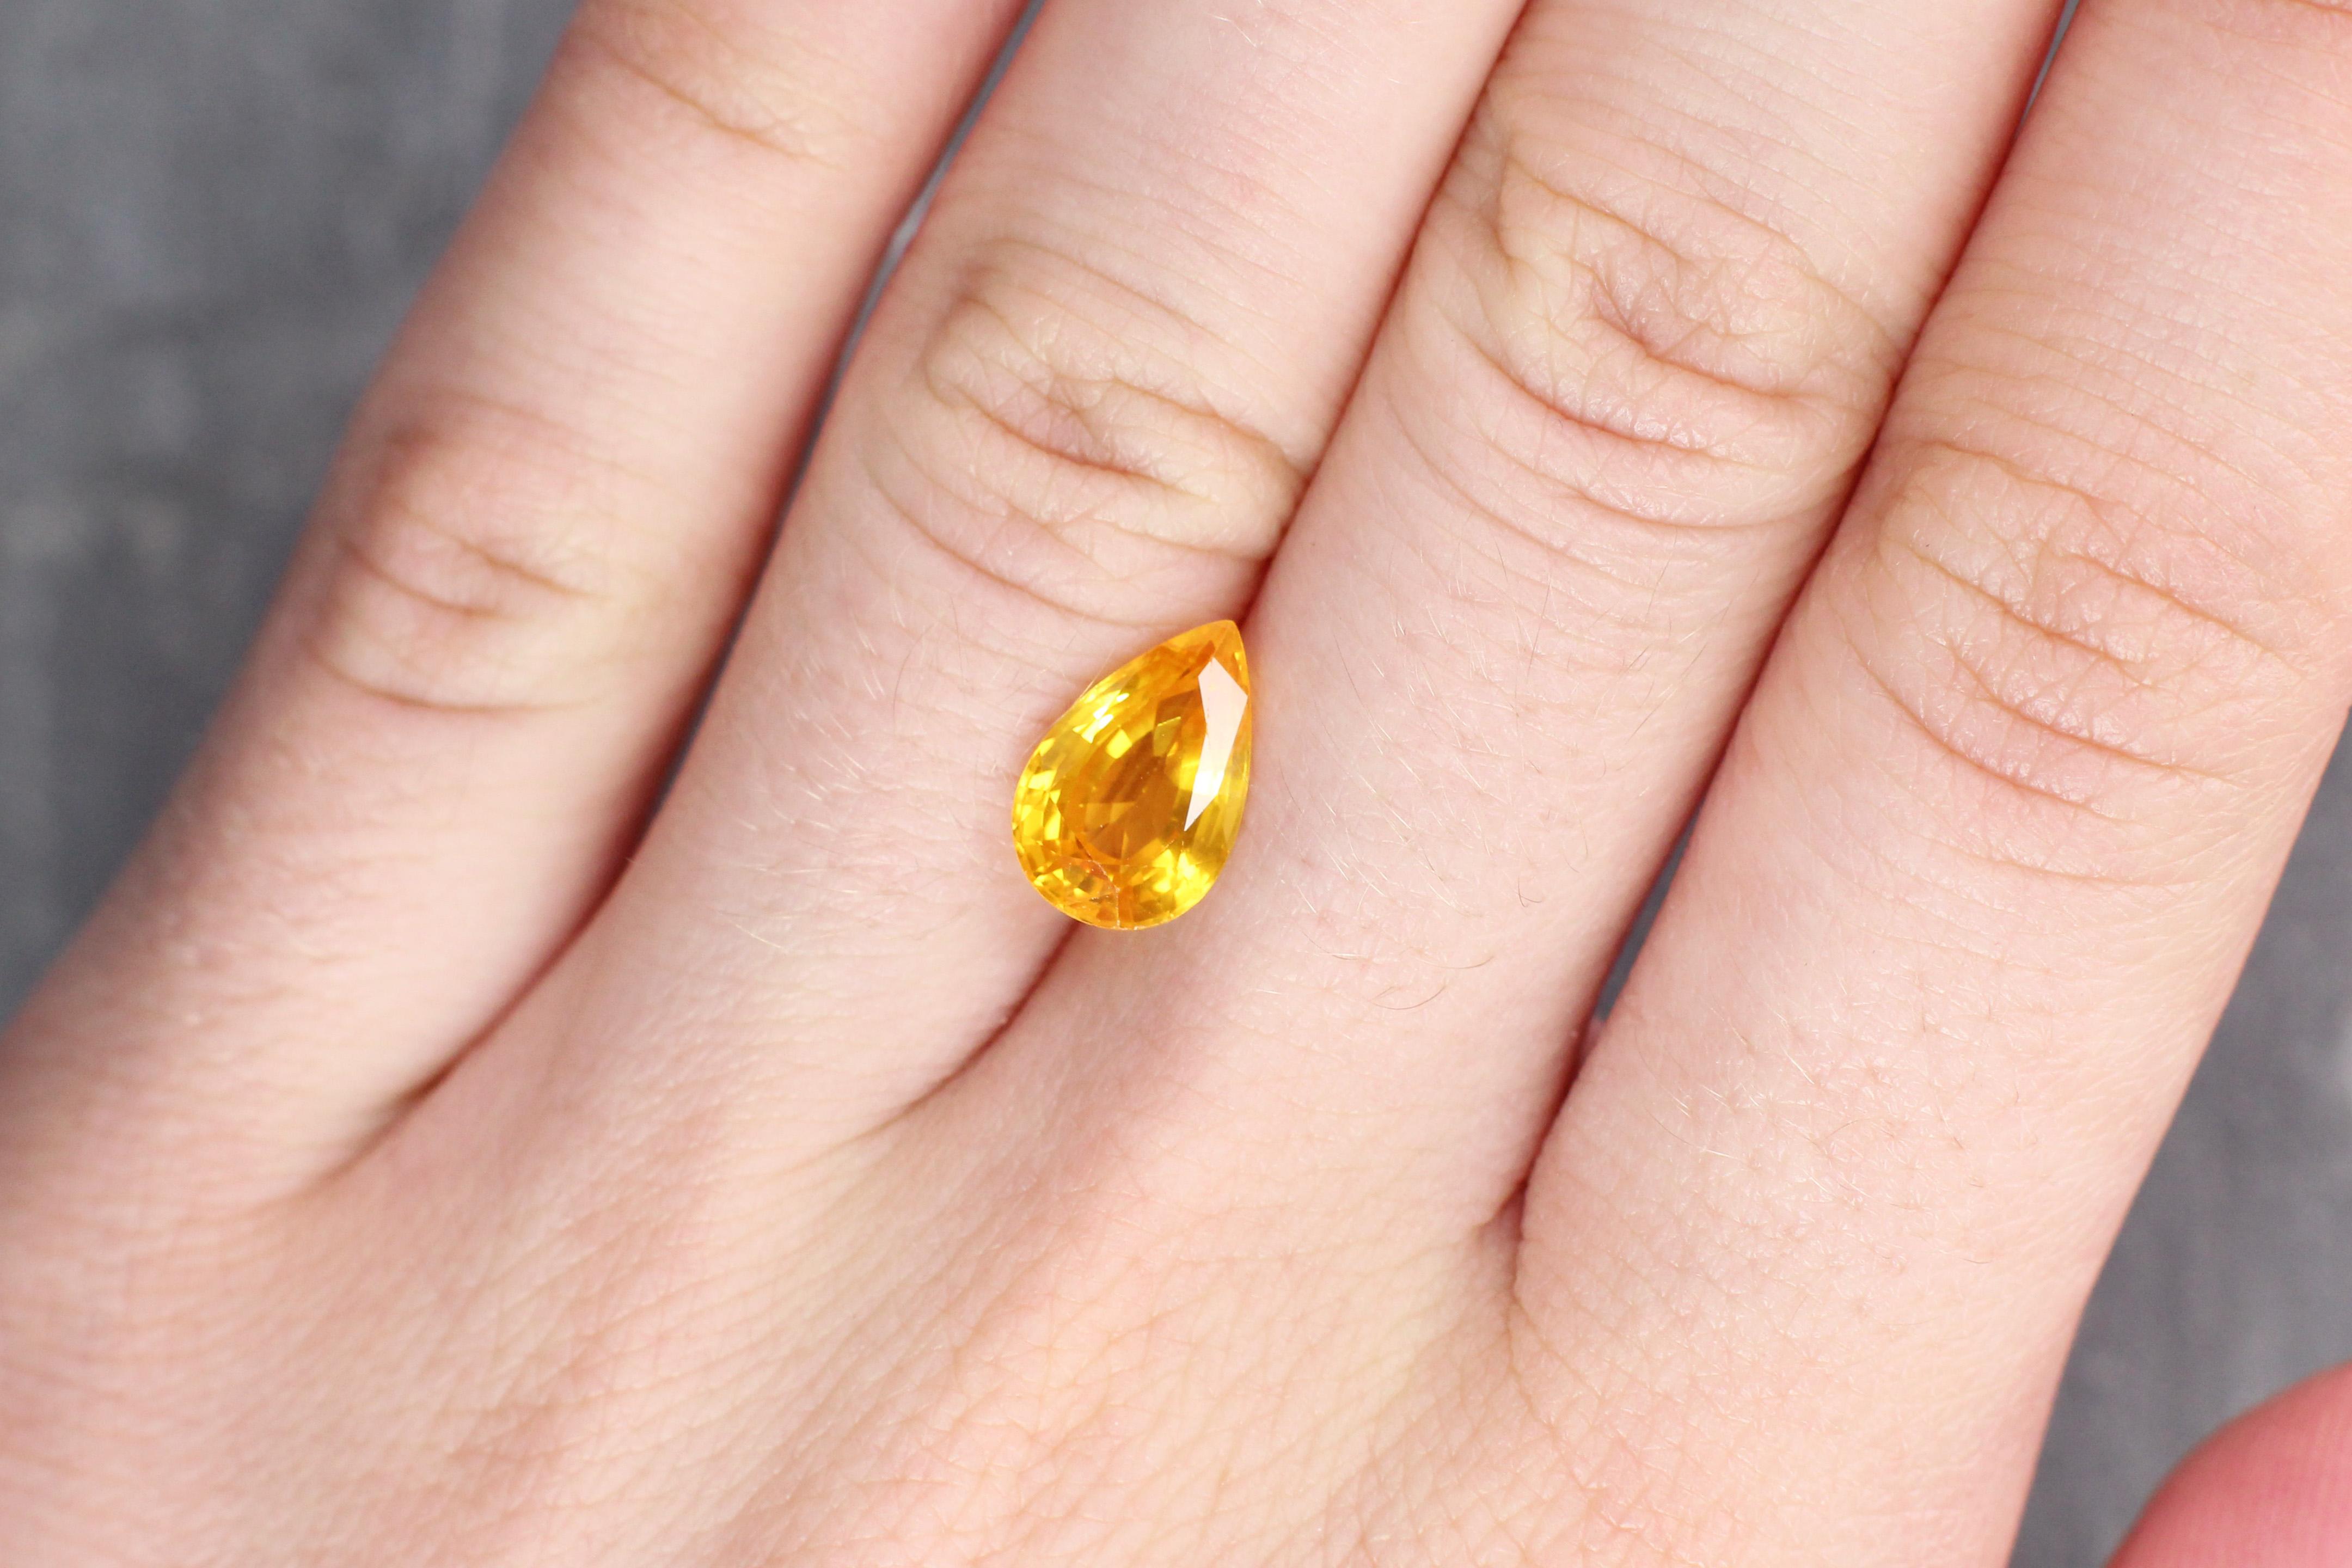 3.16 ct orangy yellow pear shape sapphire